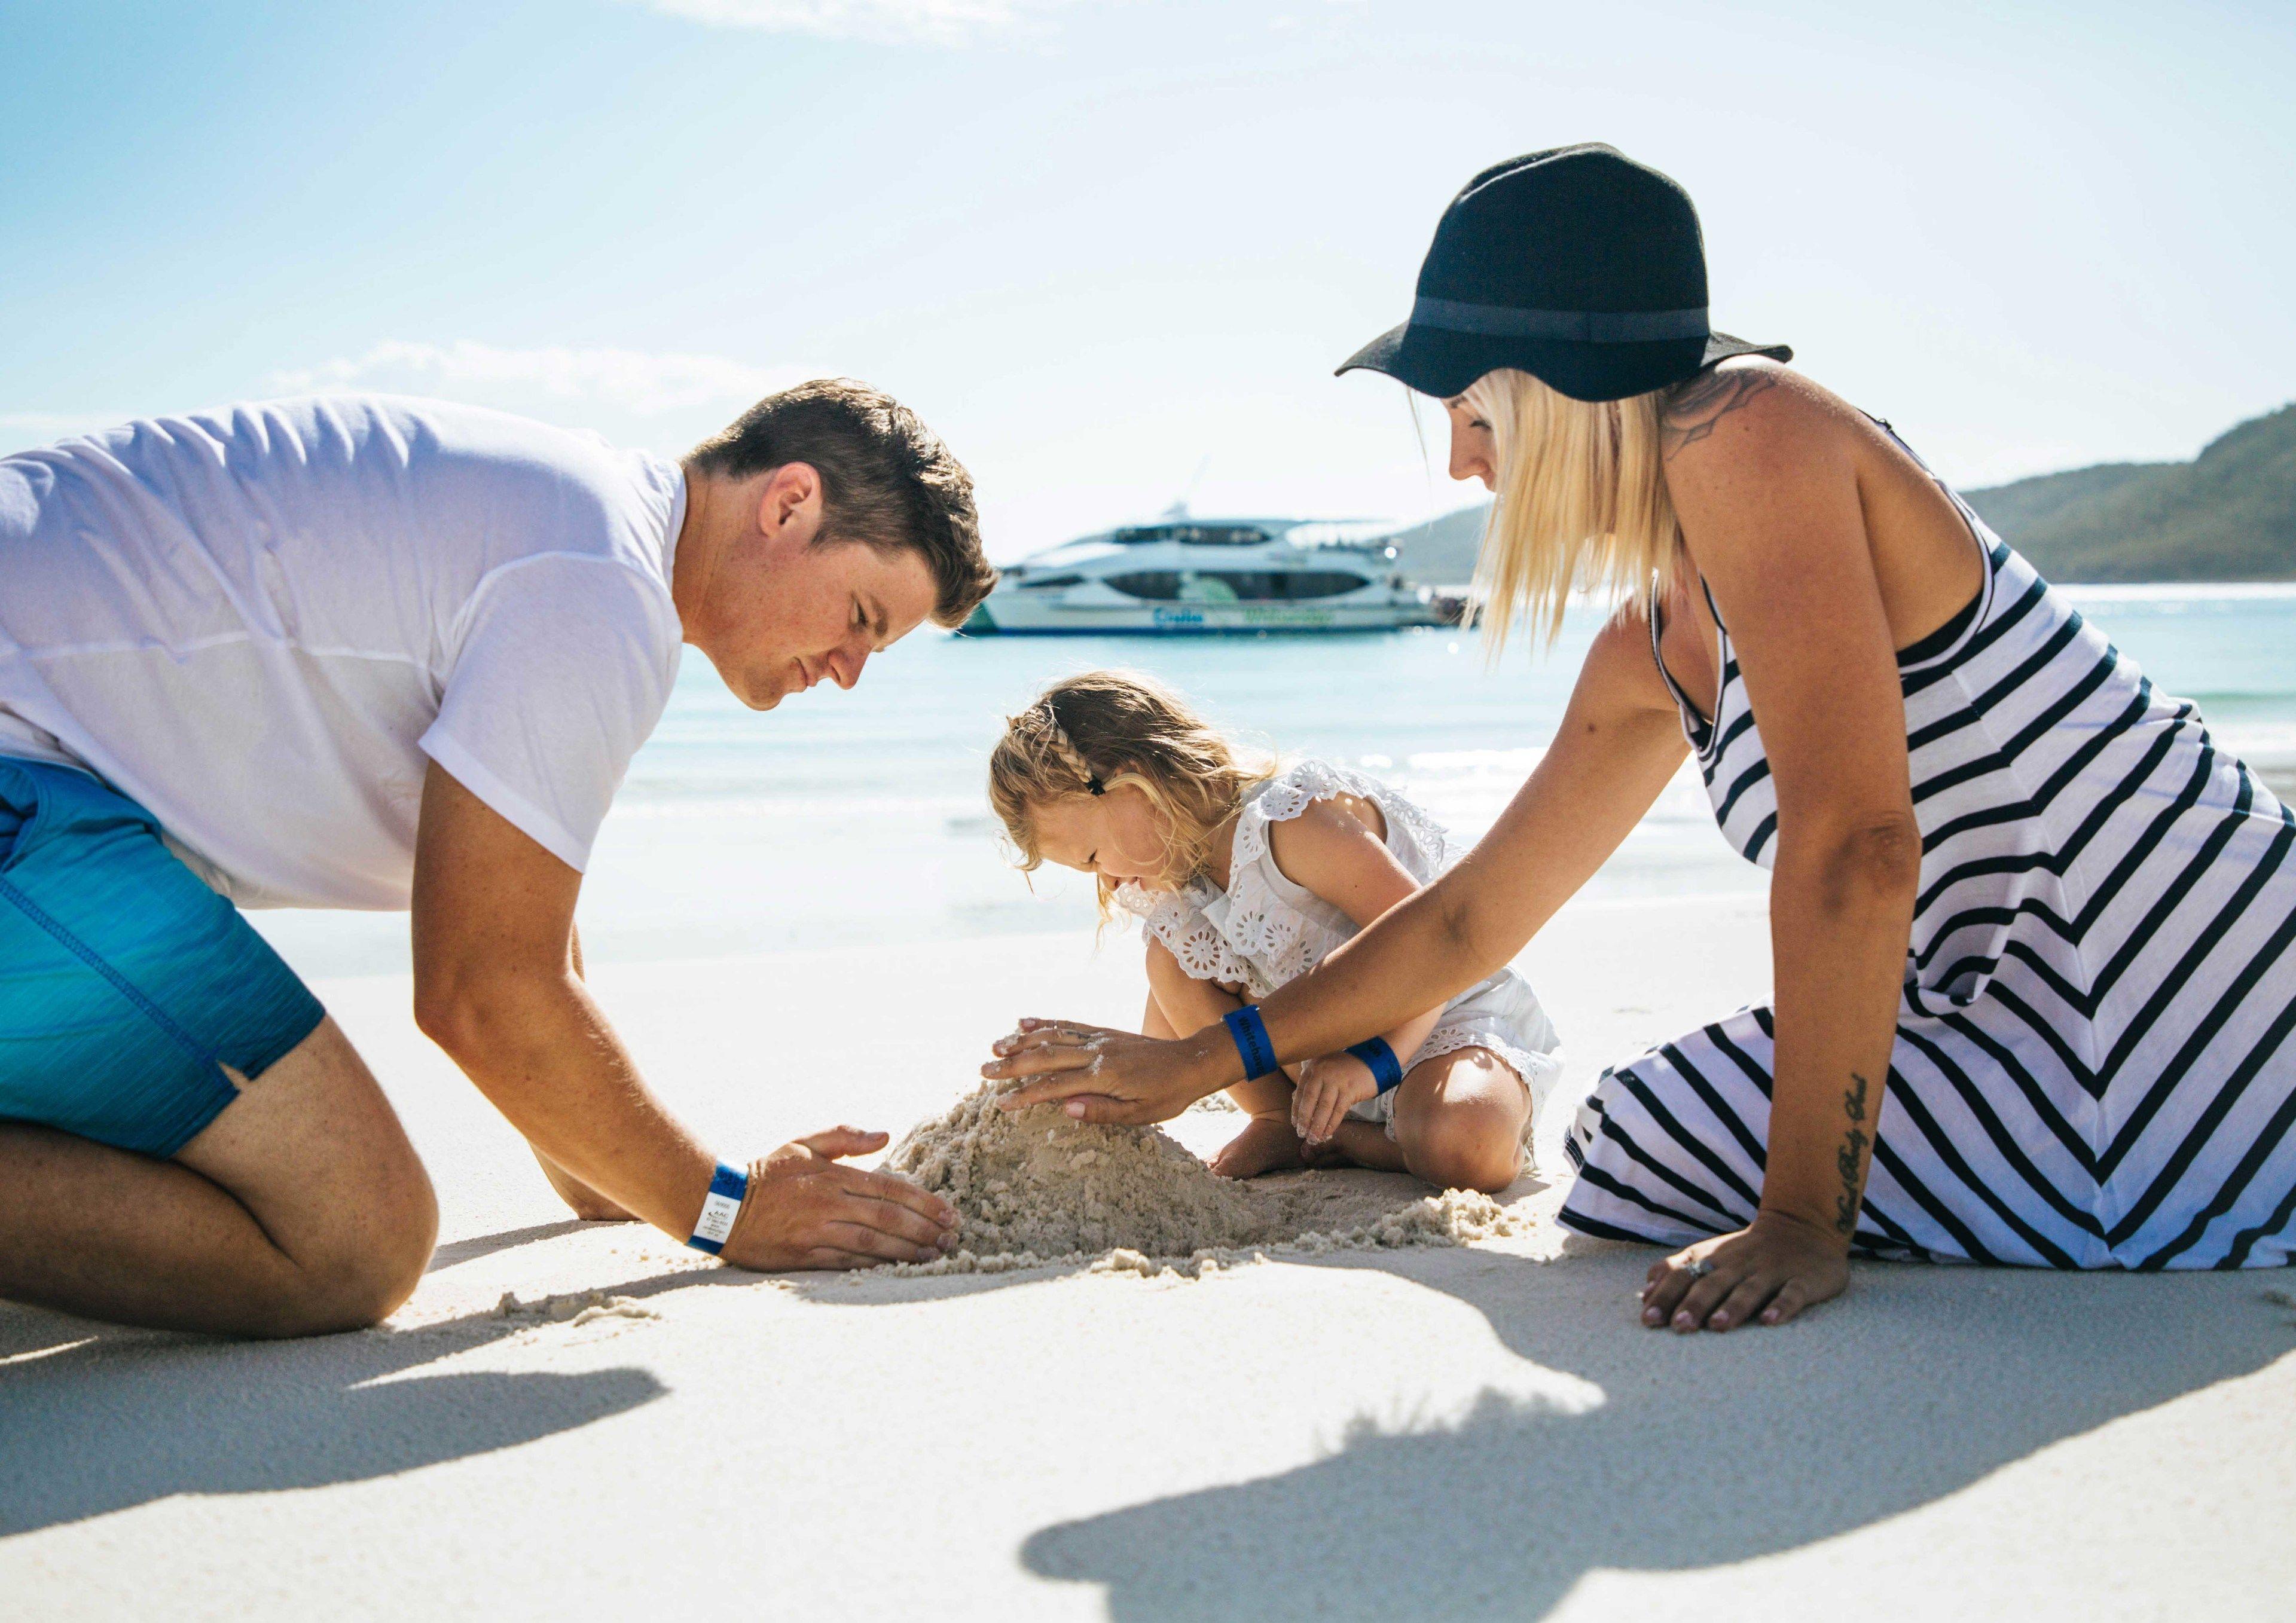 Whitsunday Island & Whitehaven Beach Half-Day Cruise